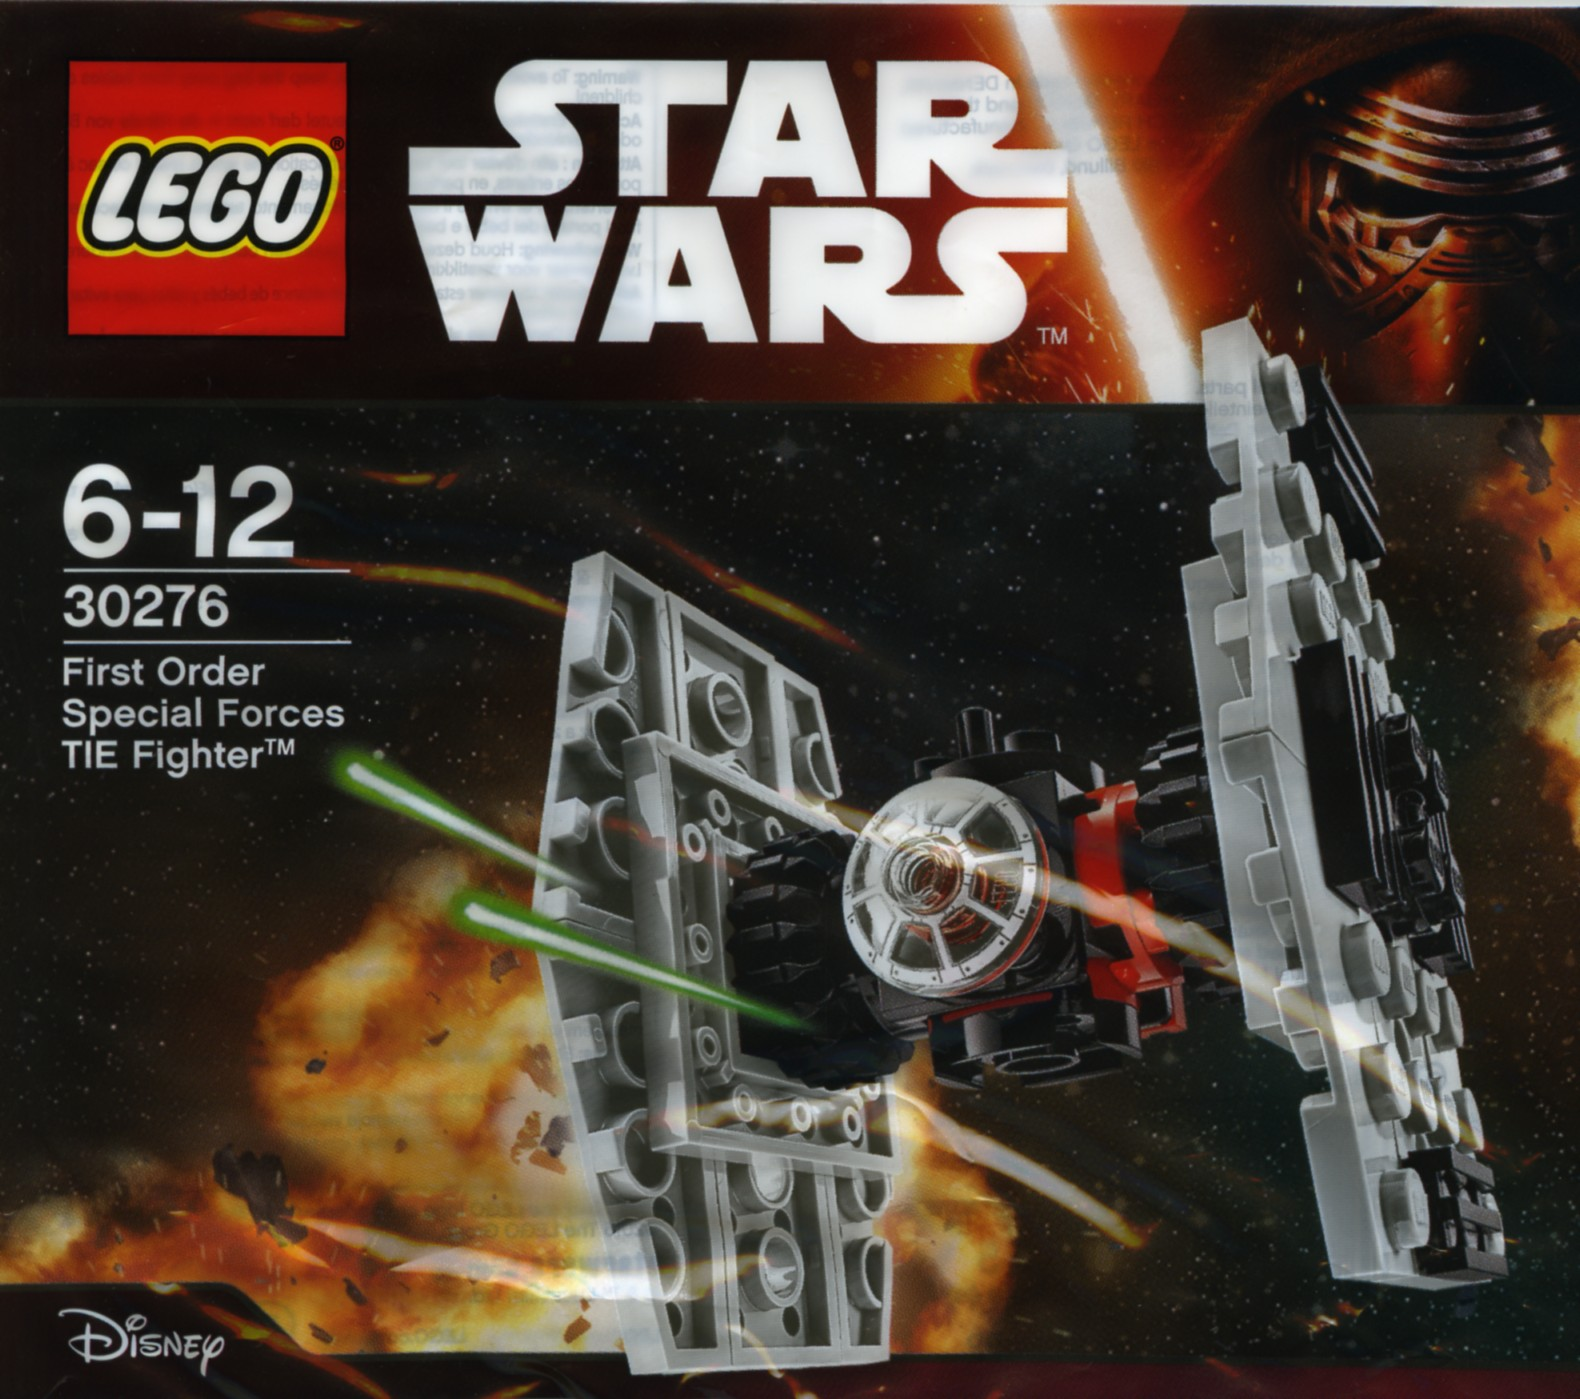 Star Wars   The Force Awakens   Brickset: LEGO set guide and